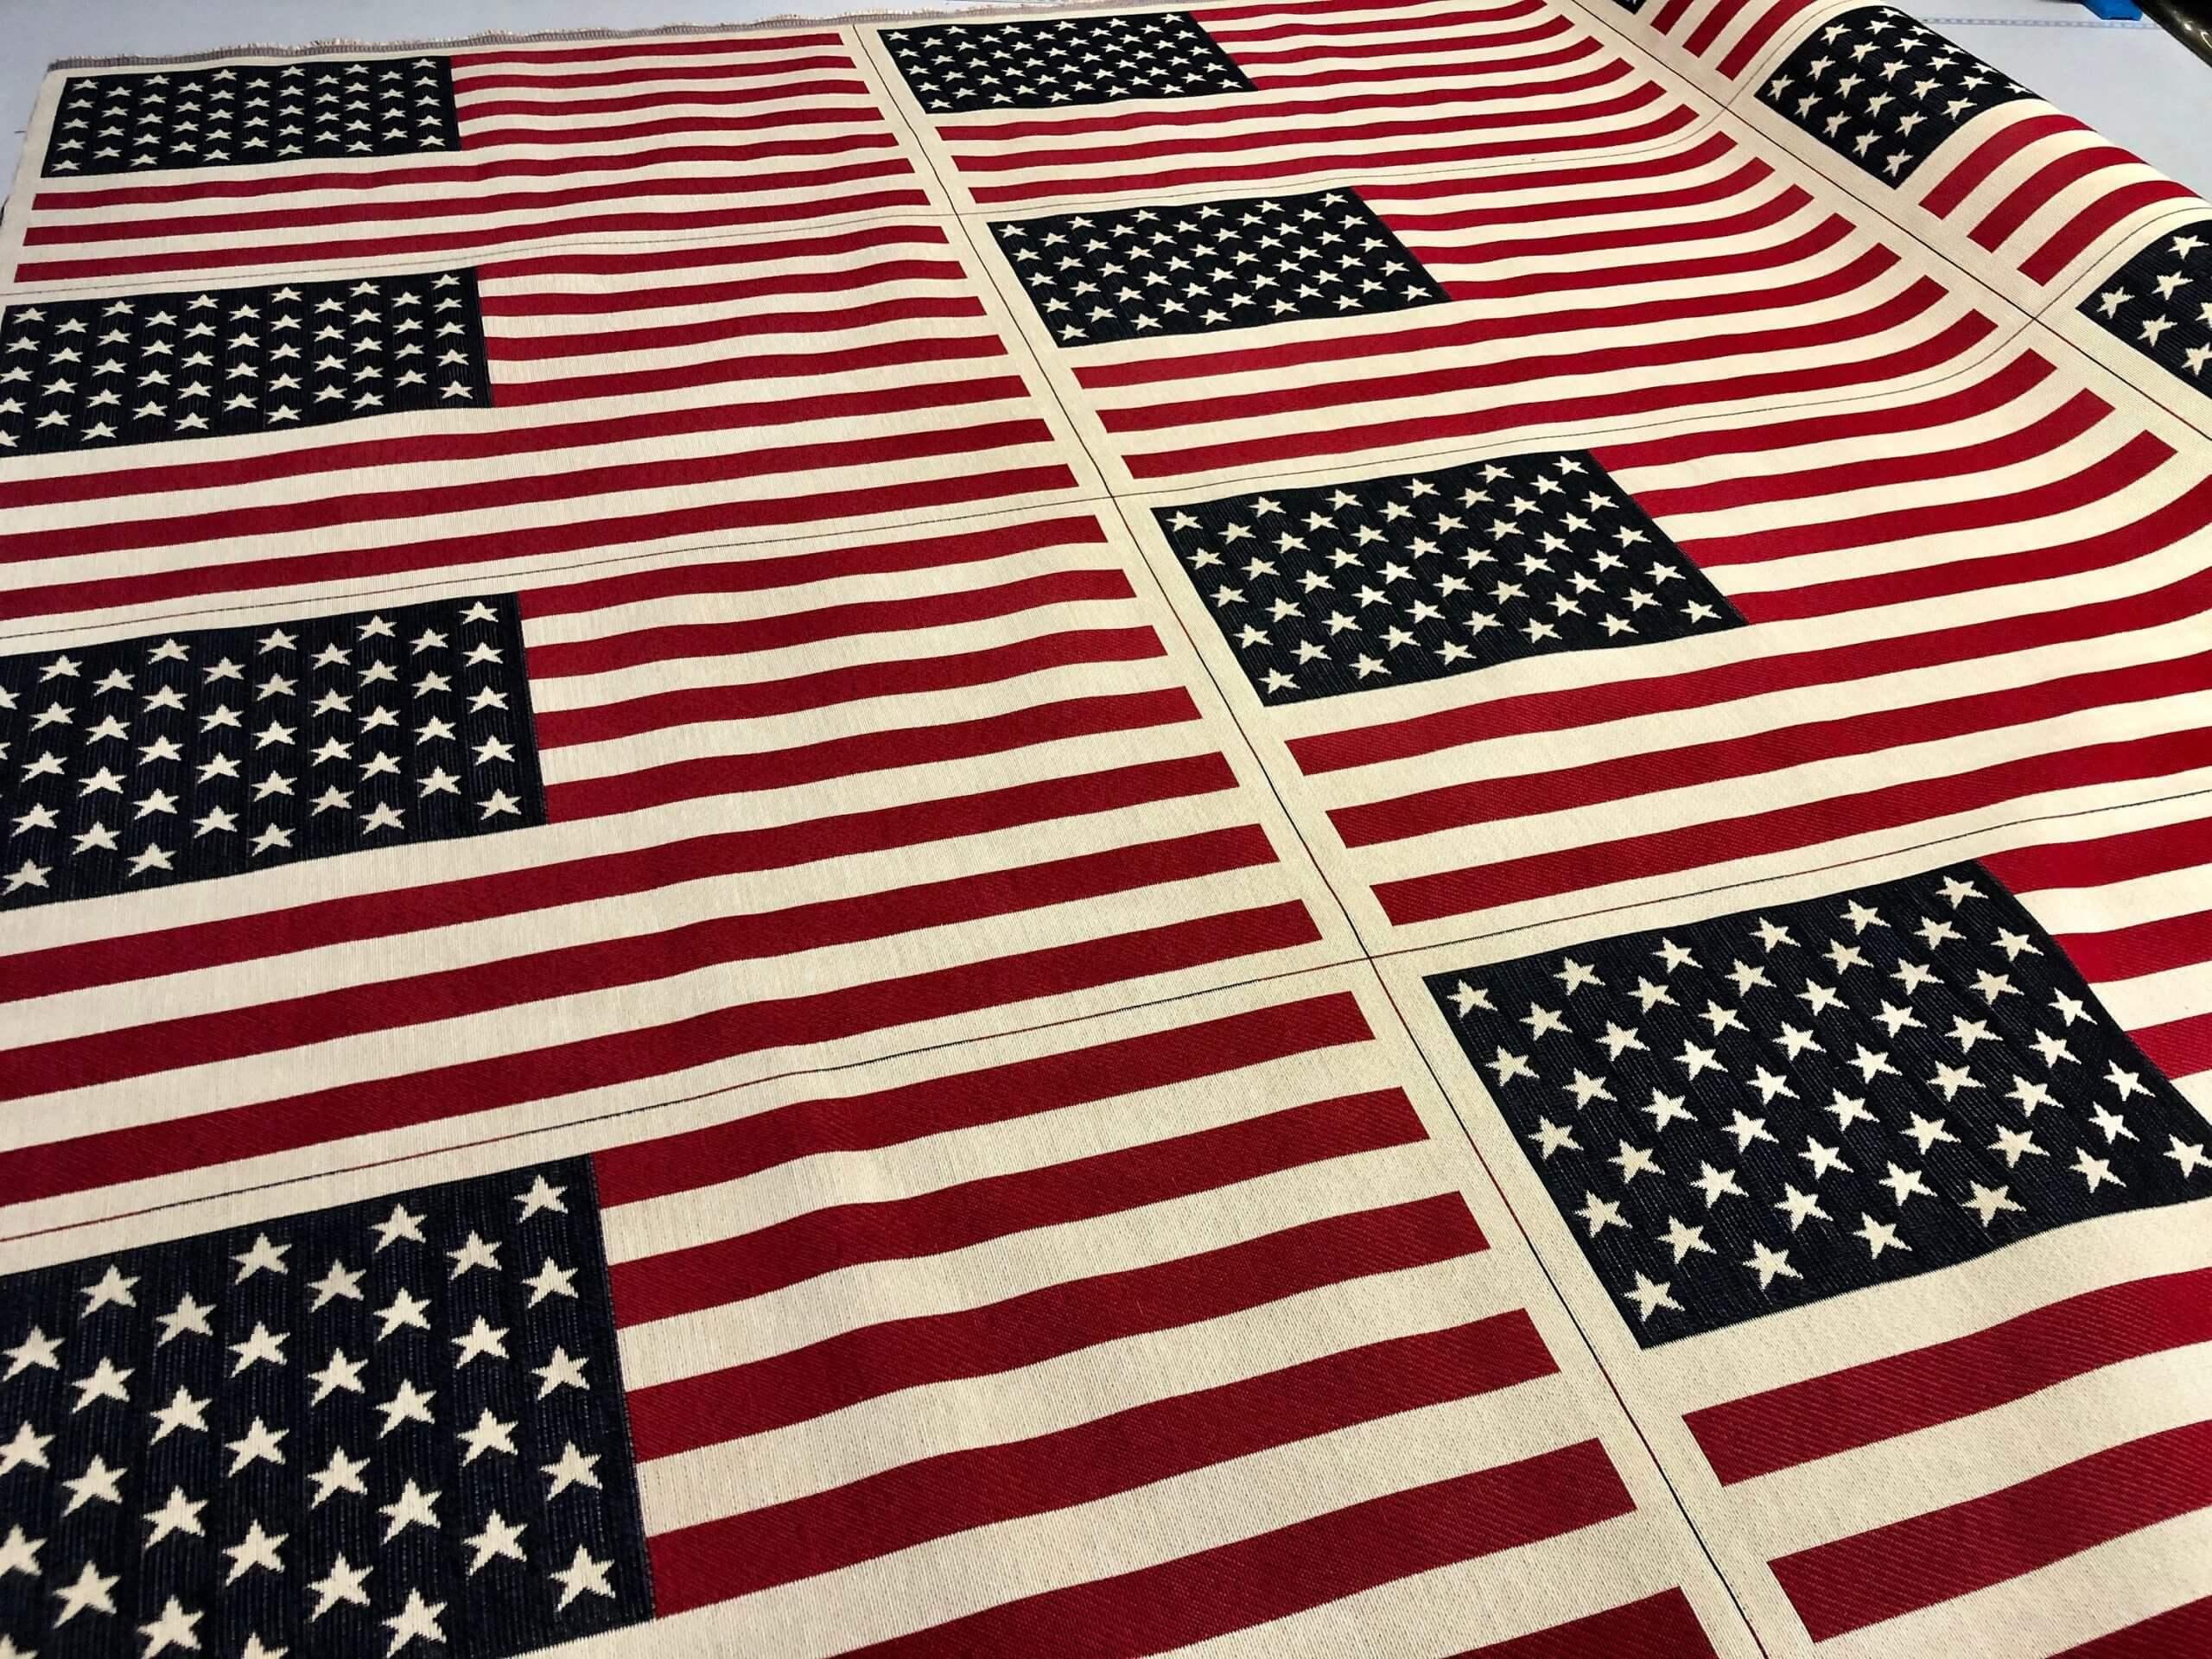 American flag Printed Fabric Panel Make A Cushion Upholstery Craft